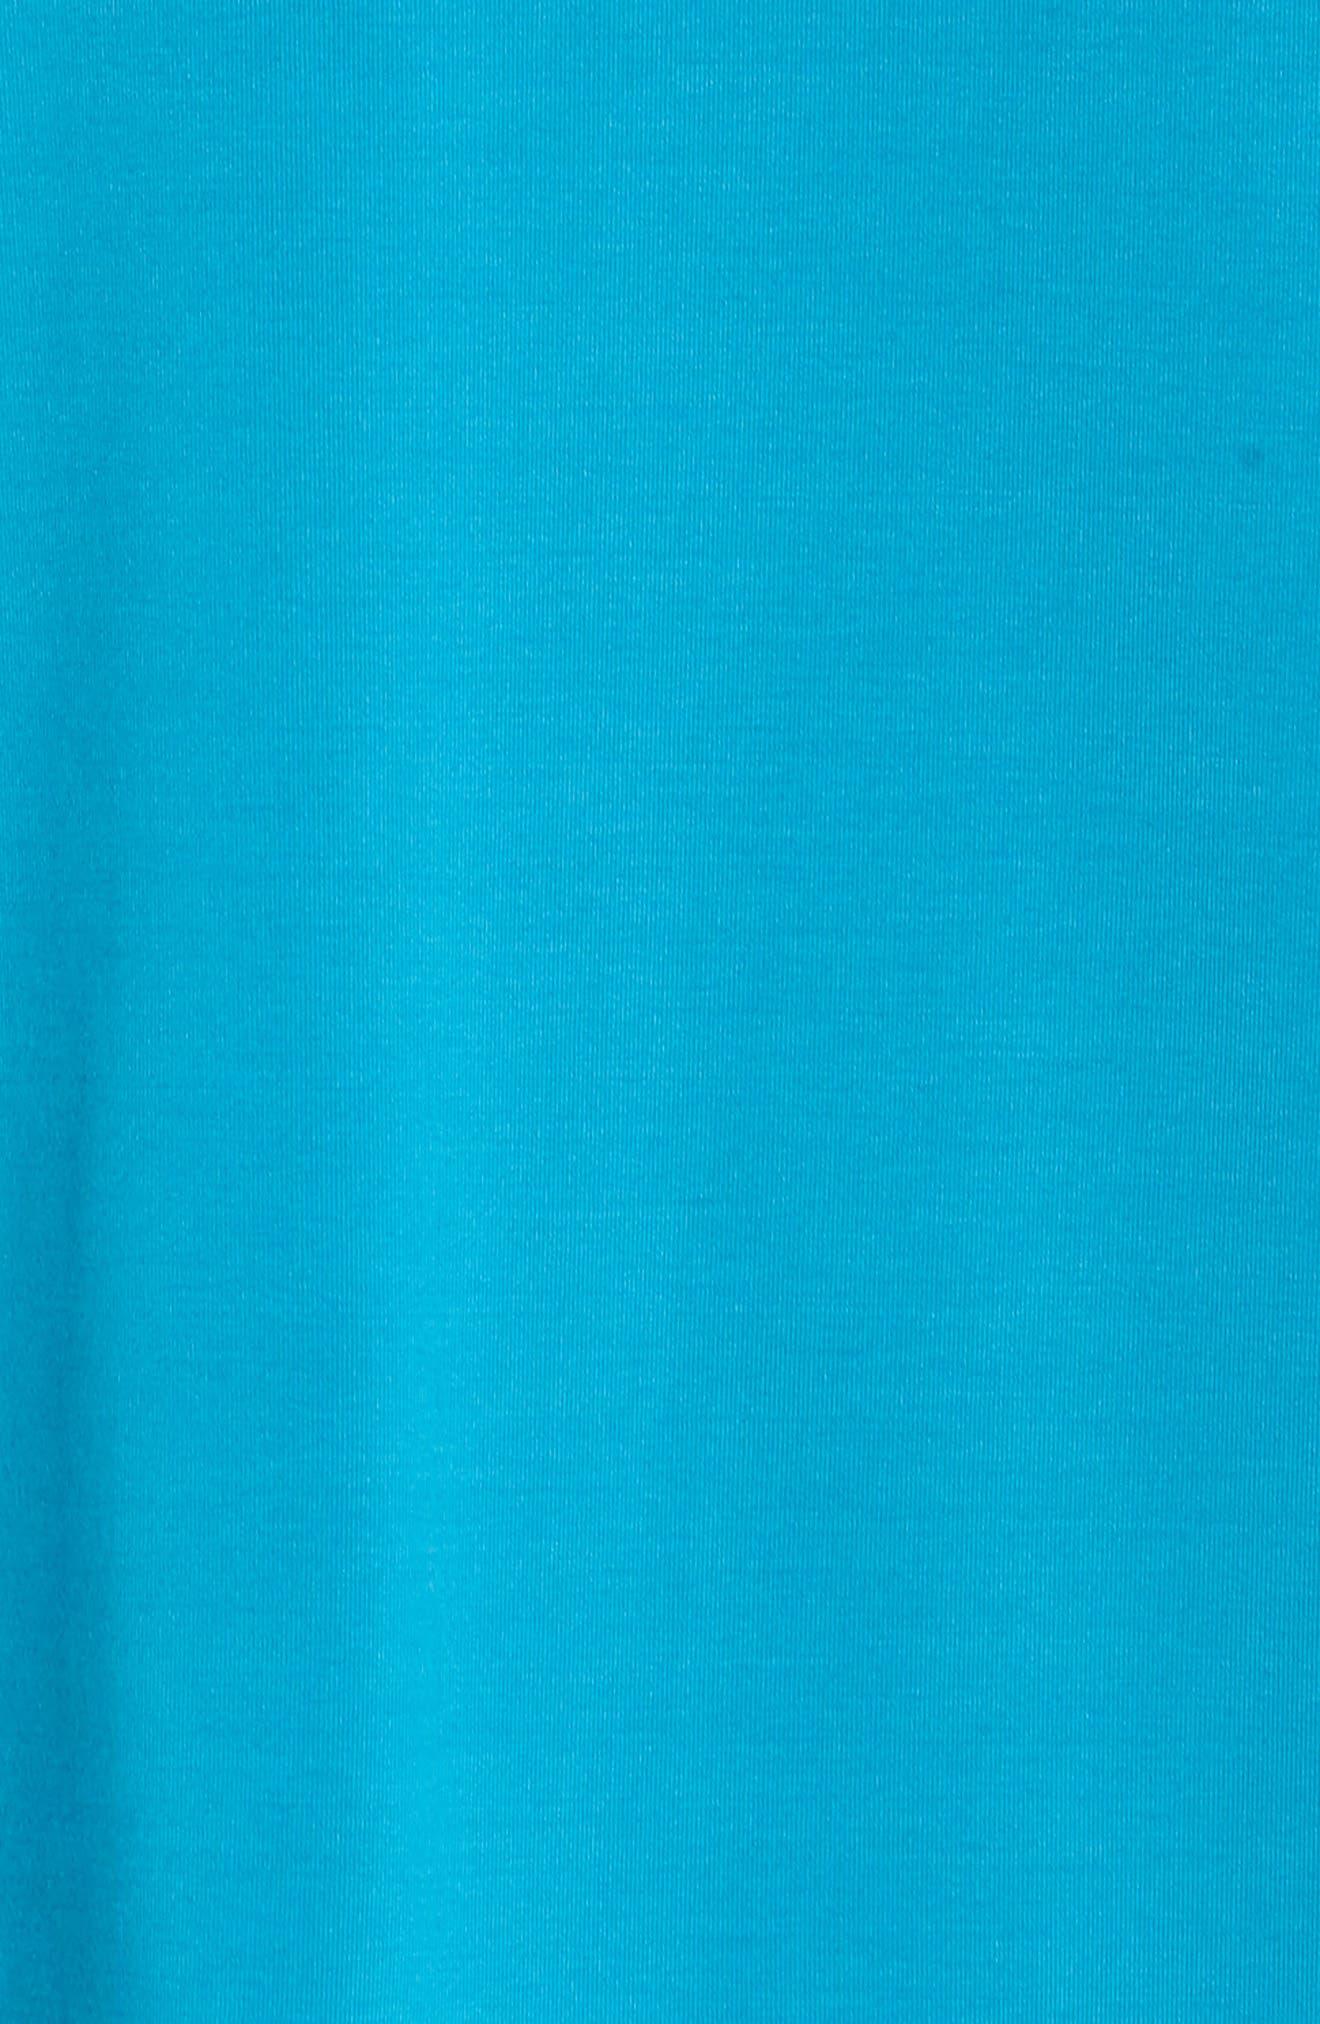 Court Dry Slam Tennis Tank,                             Alternate thumbnail 6, color,                             Neo Turquoise/ Black